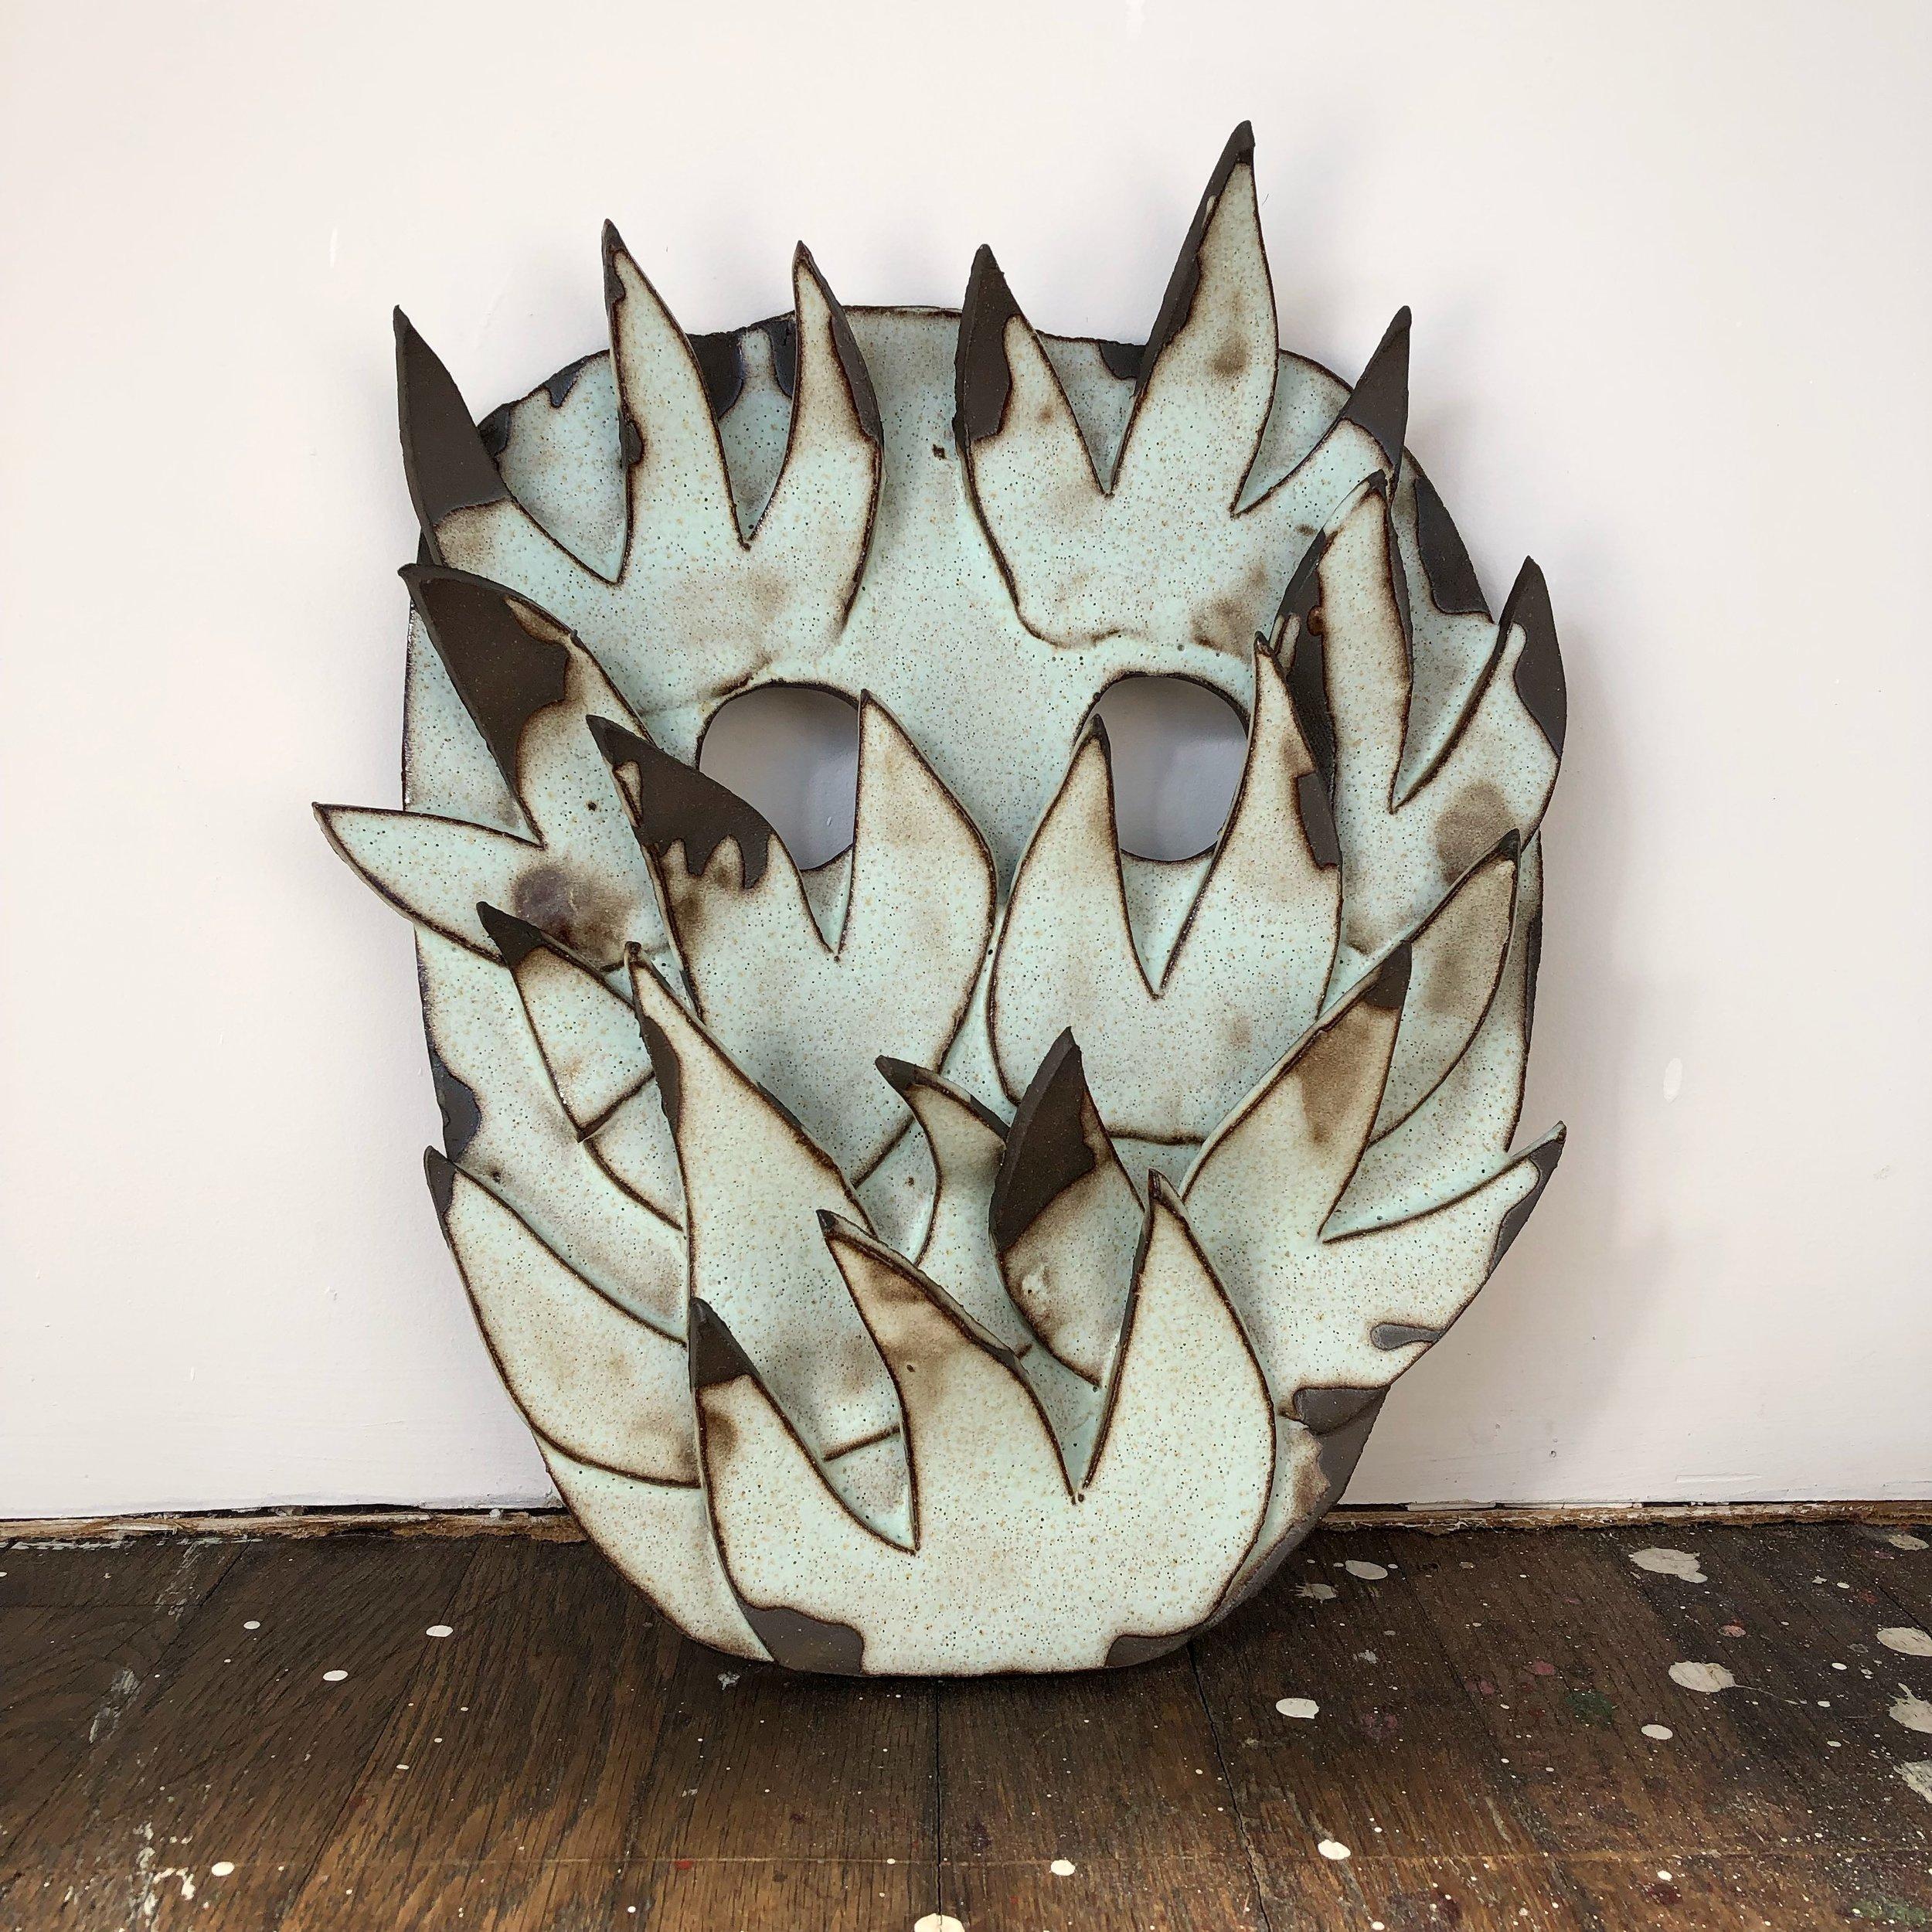 Puck, 2019, glazed ceramic, 10 x 9 x 2 inches